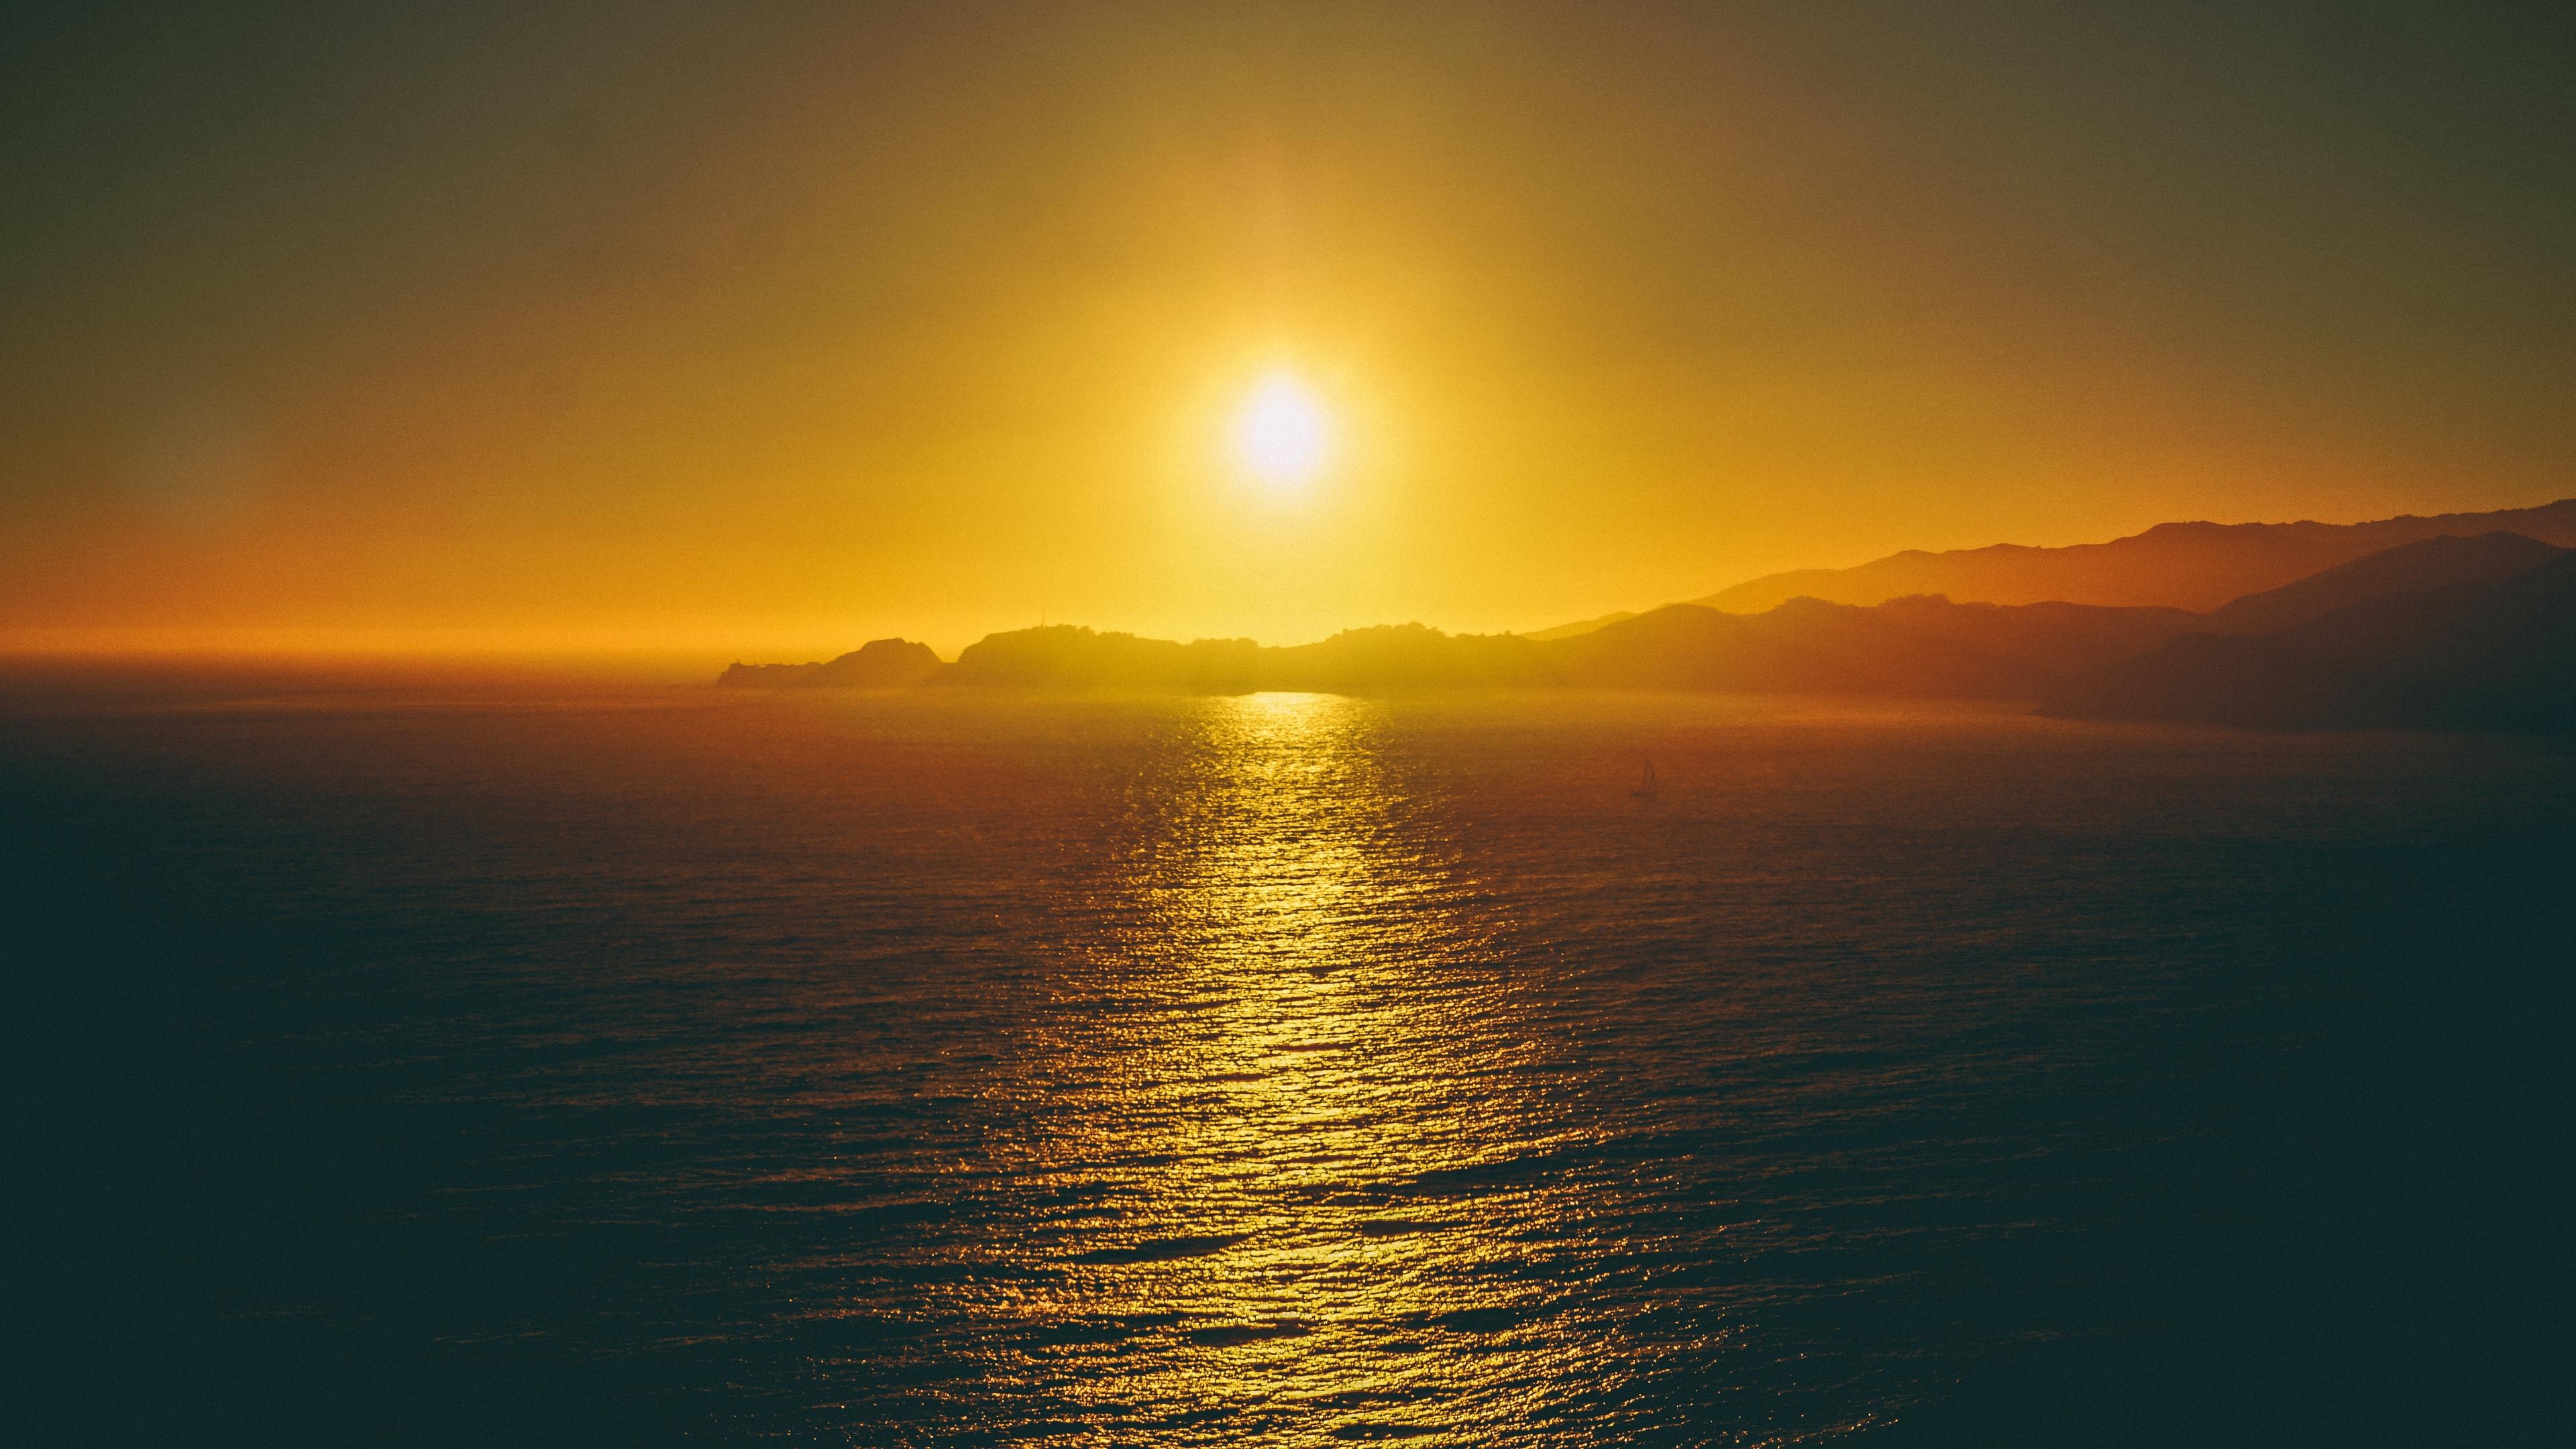 sea sunset sky 4k 1541114576 - sea, sunset, sky 4k - sunset, Sky, Sea